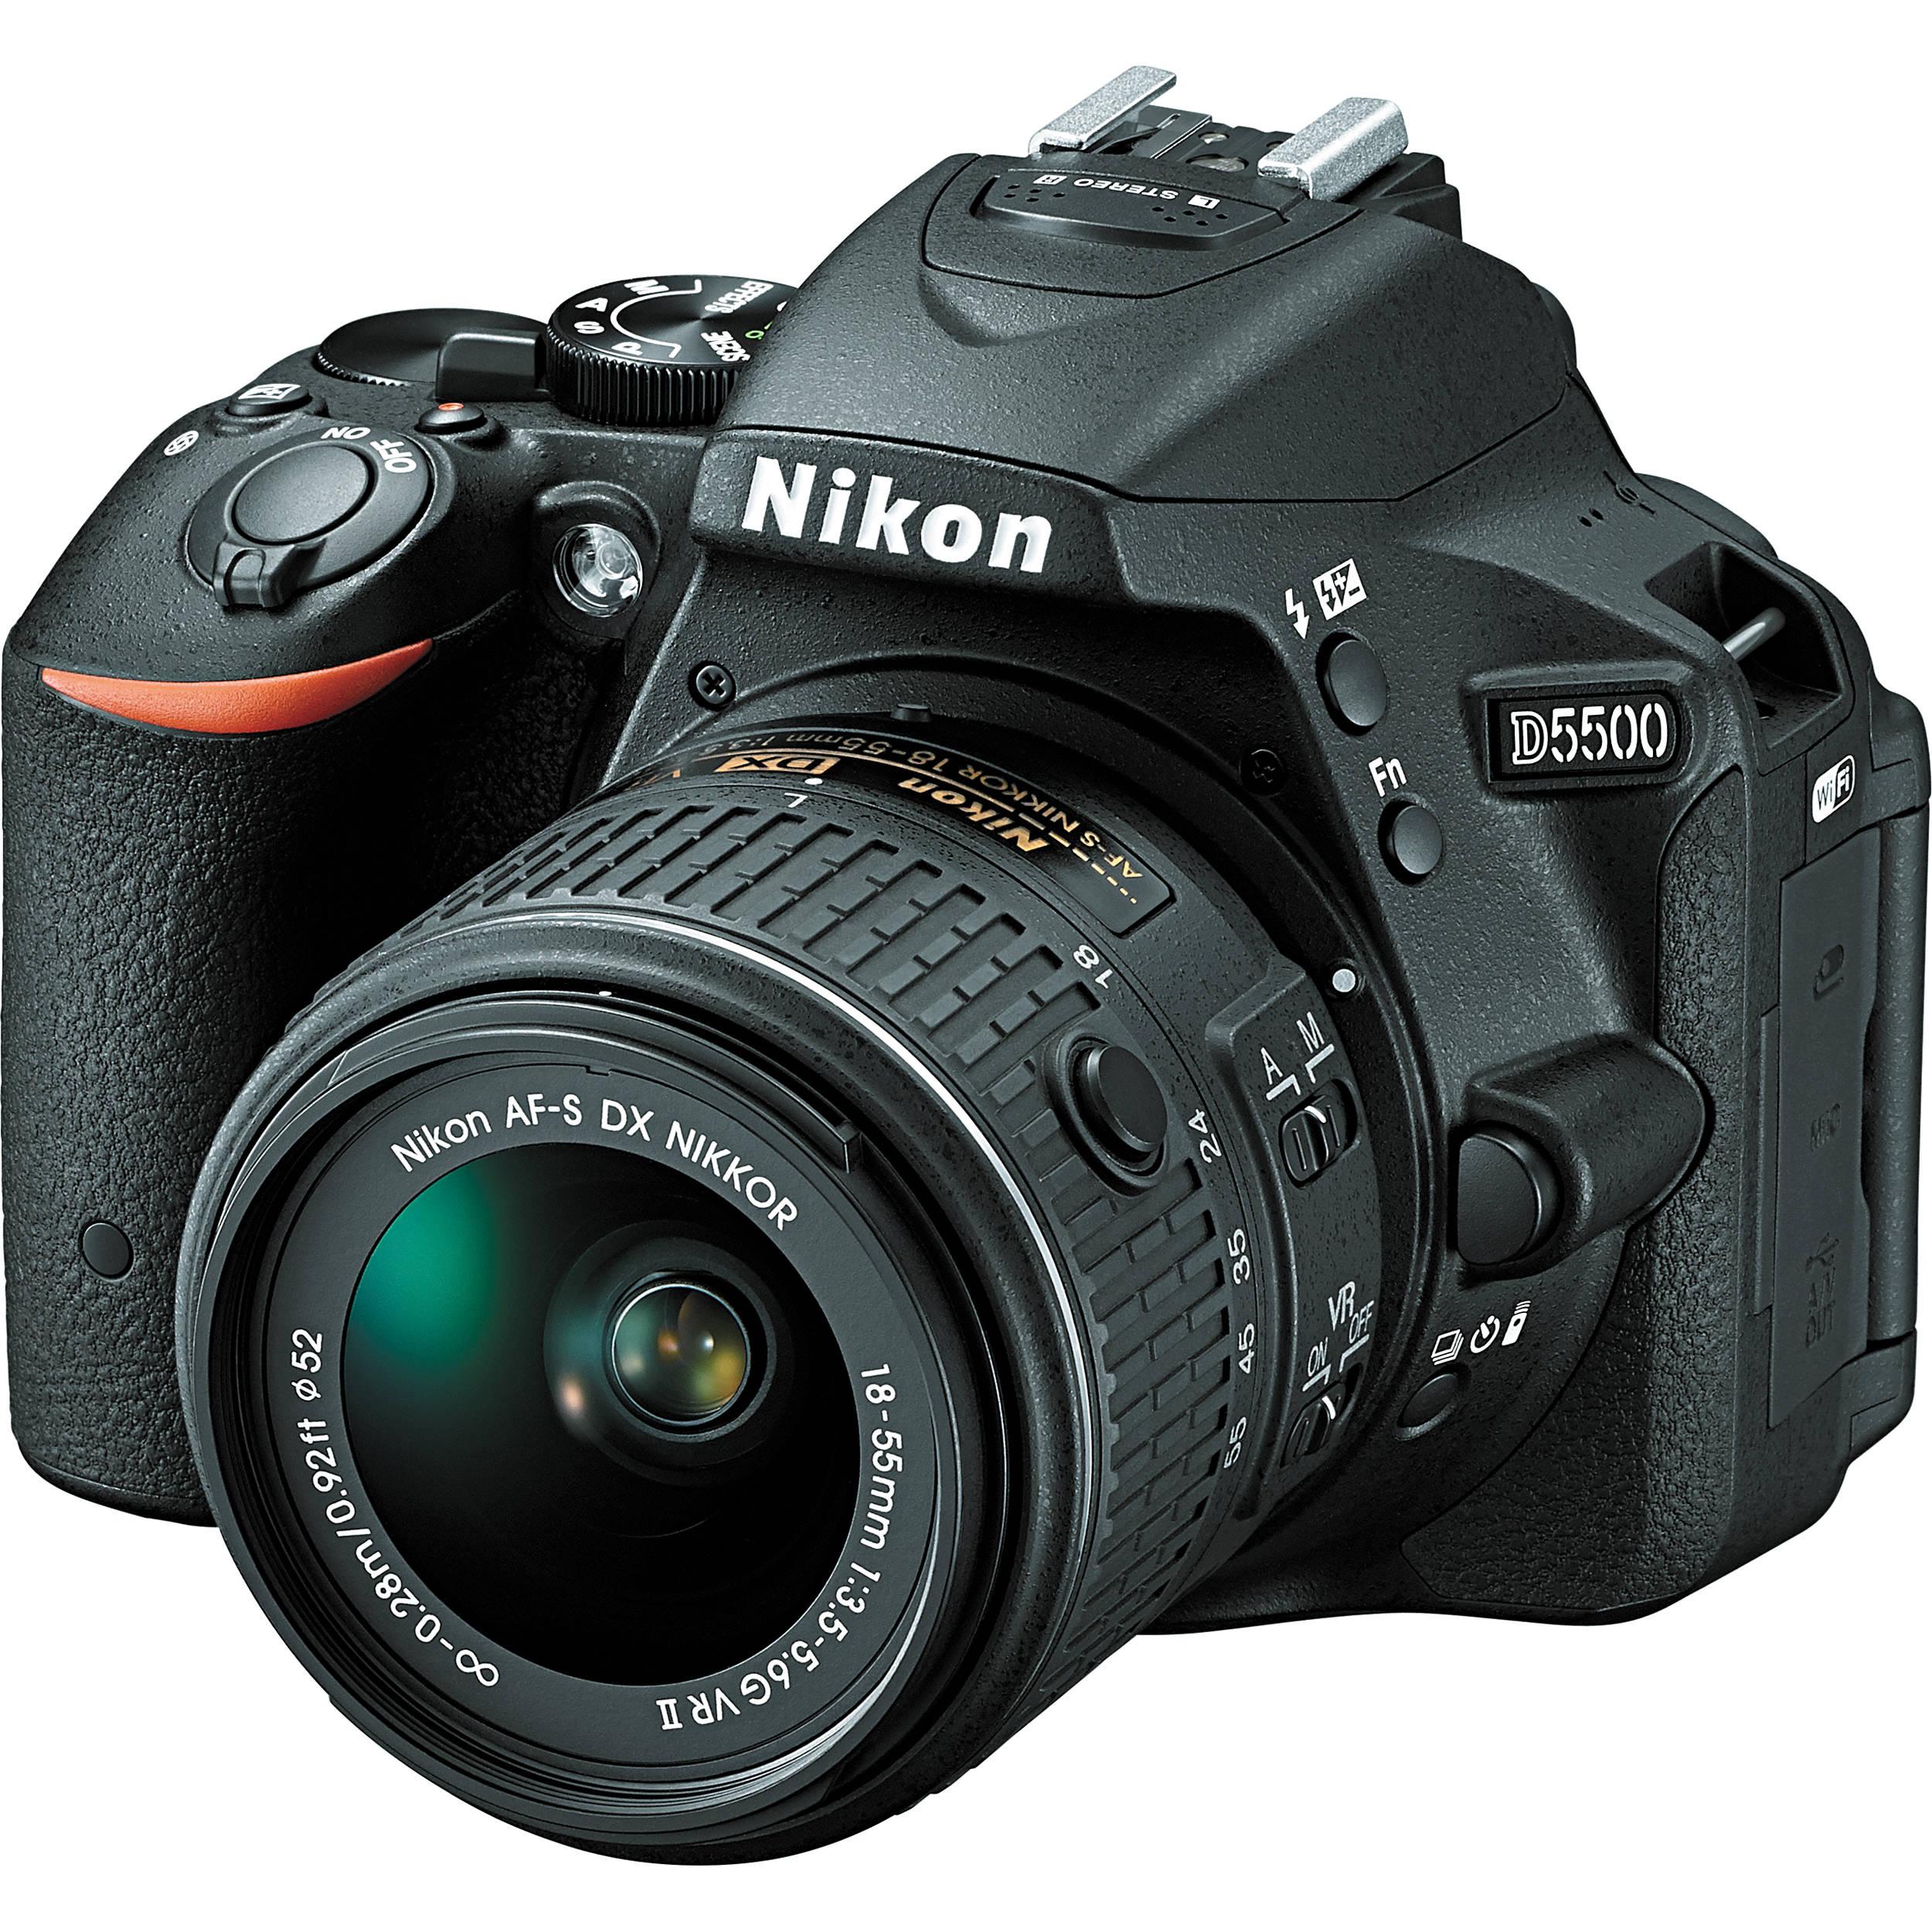 Di kelas kamera DSLR pemula Canon 760D Harga Rp 9 28 juta body only bersaing ketat dengan Nikon D5500 Harga Rp 8 6 juta dengan lensa 18 55mm VR II